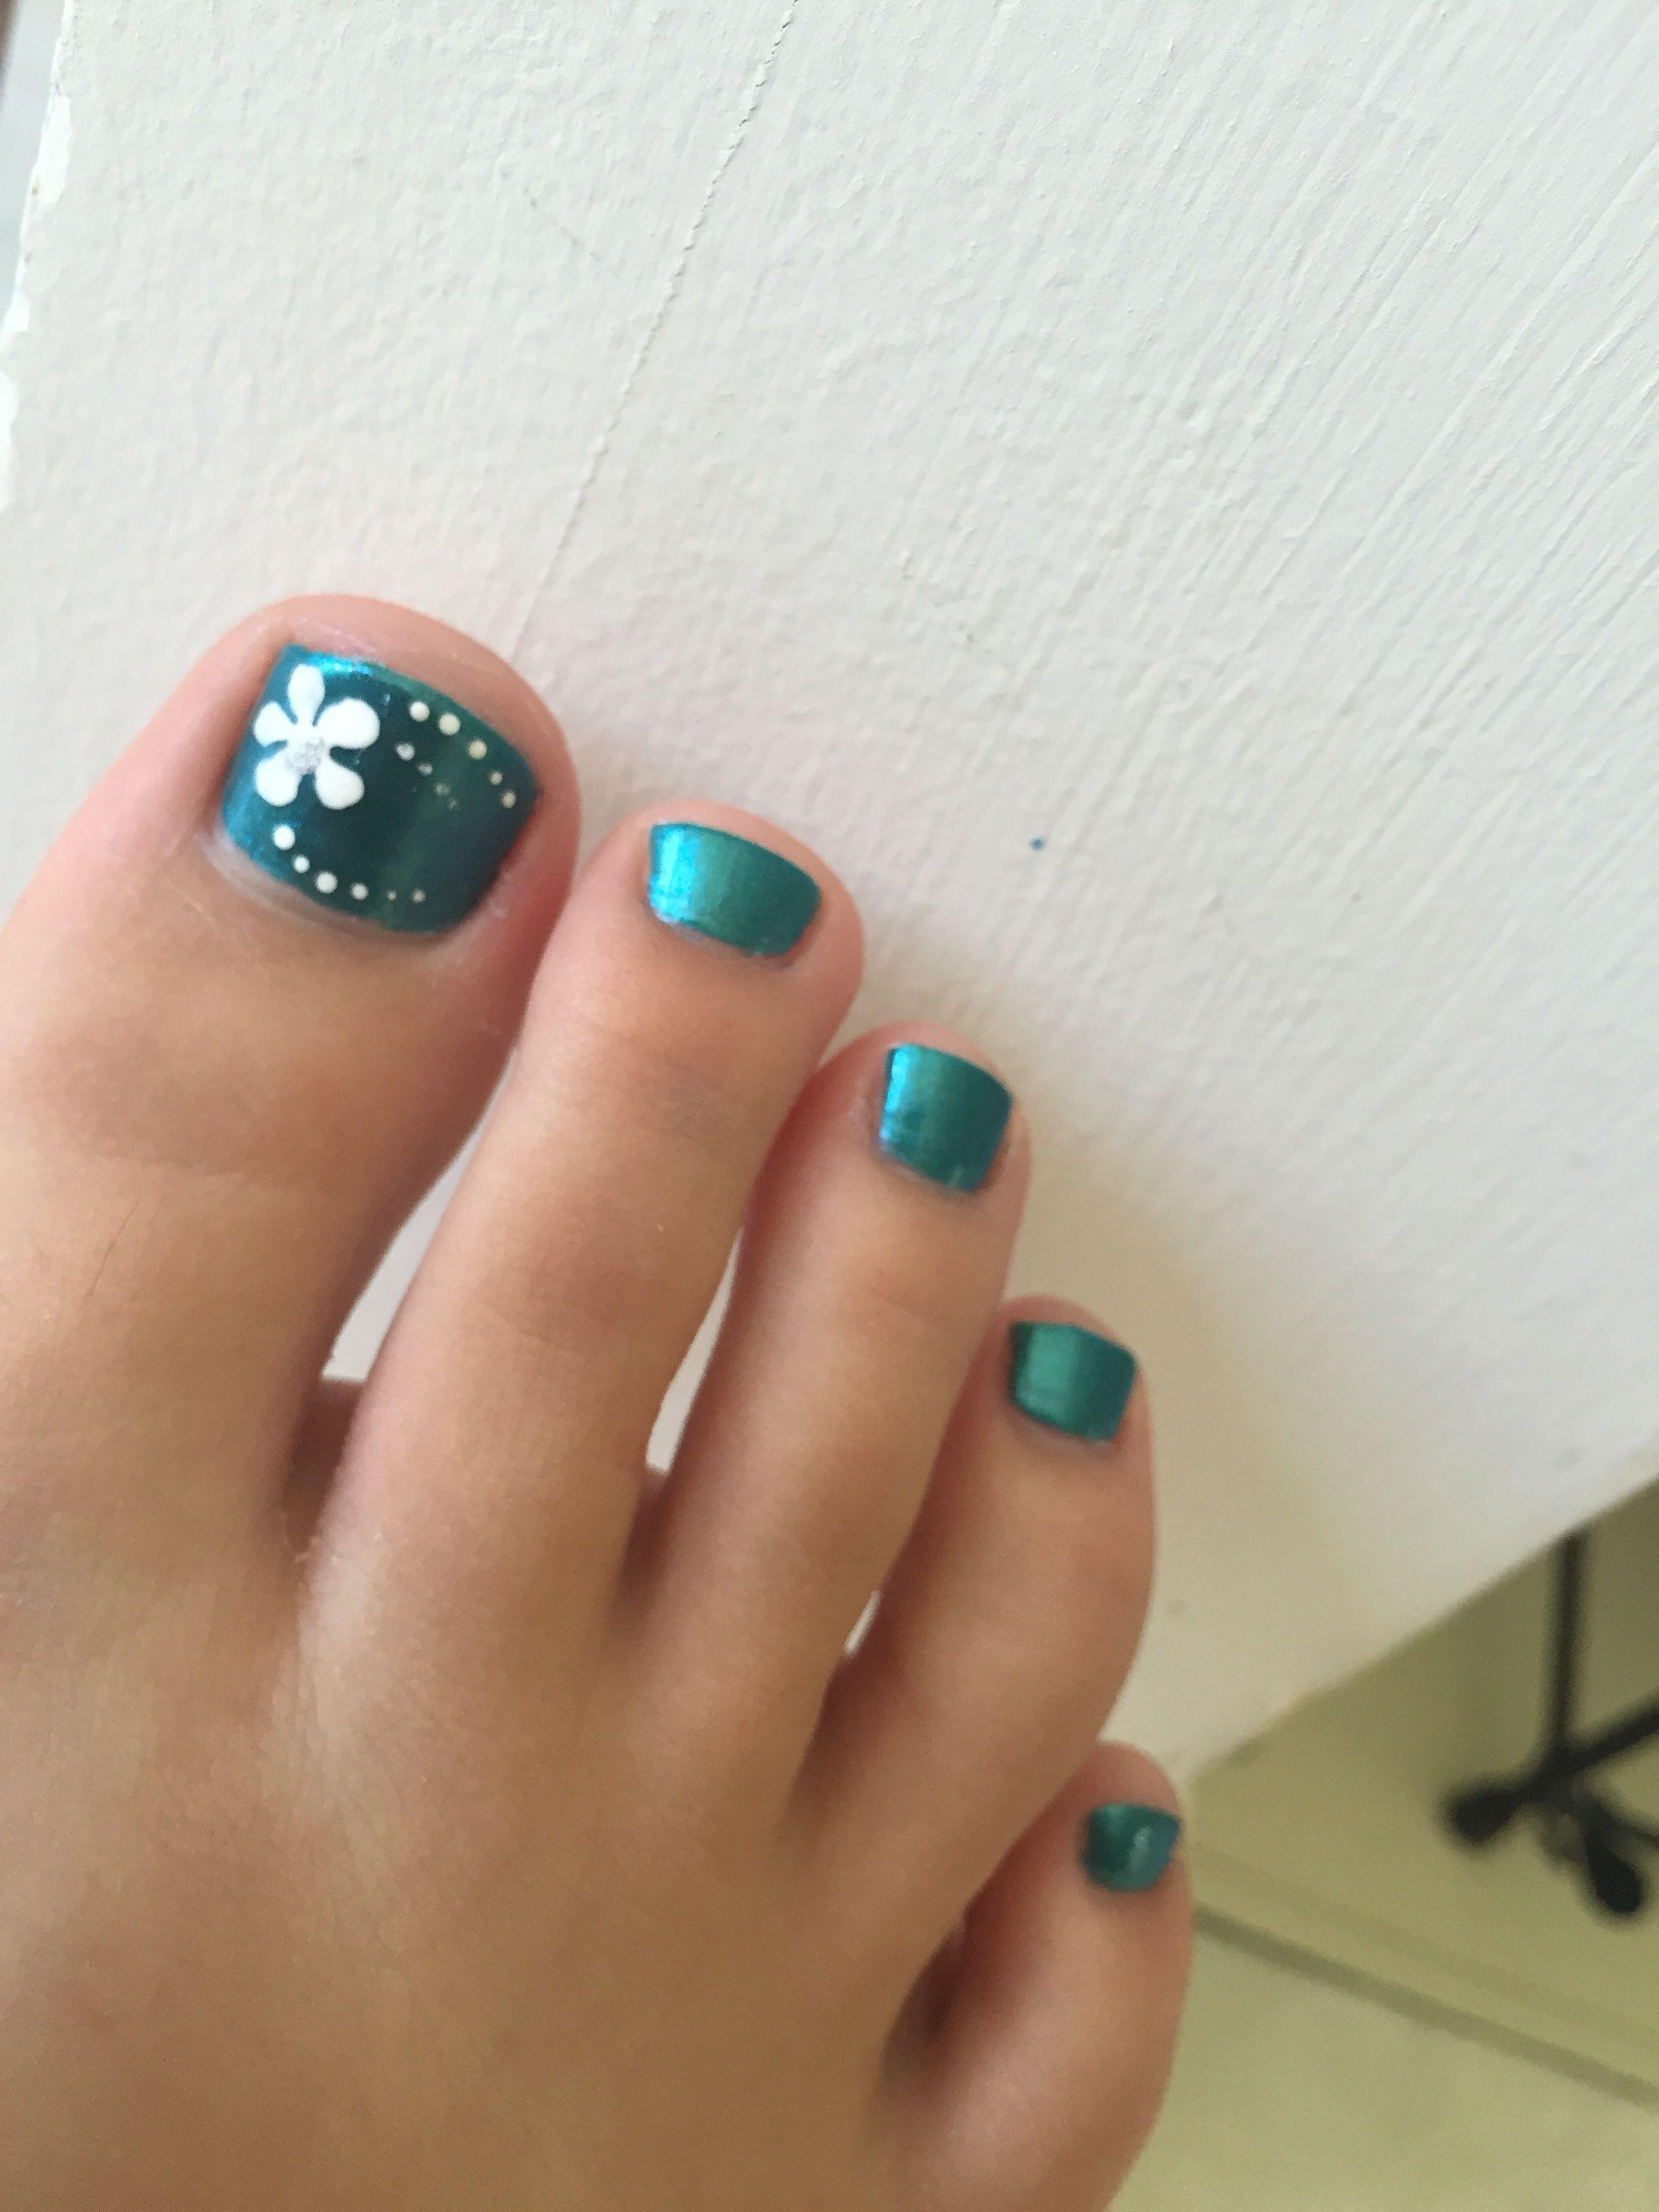 Blue toenails with flower nails toenails toes toe nail art